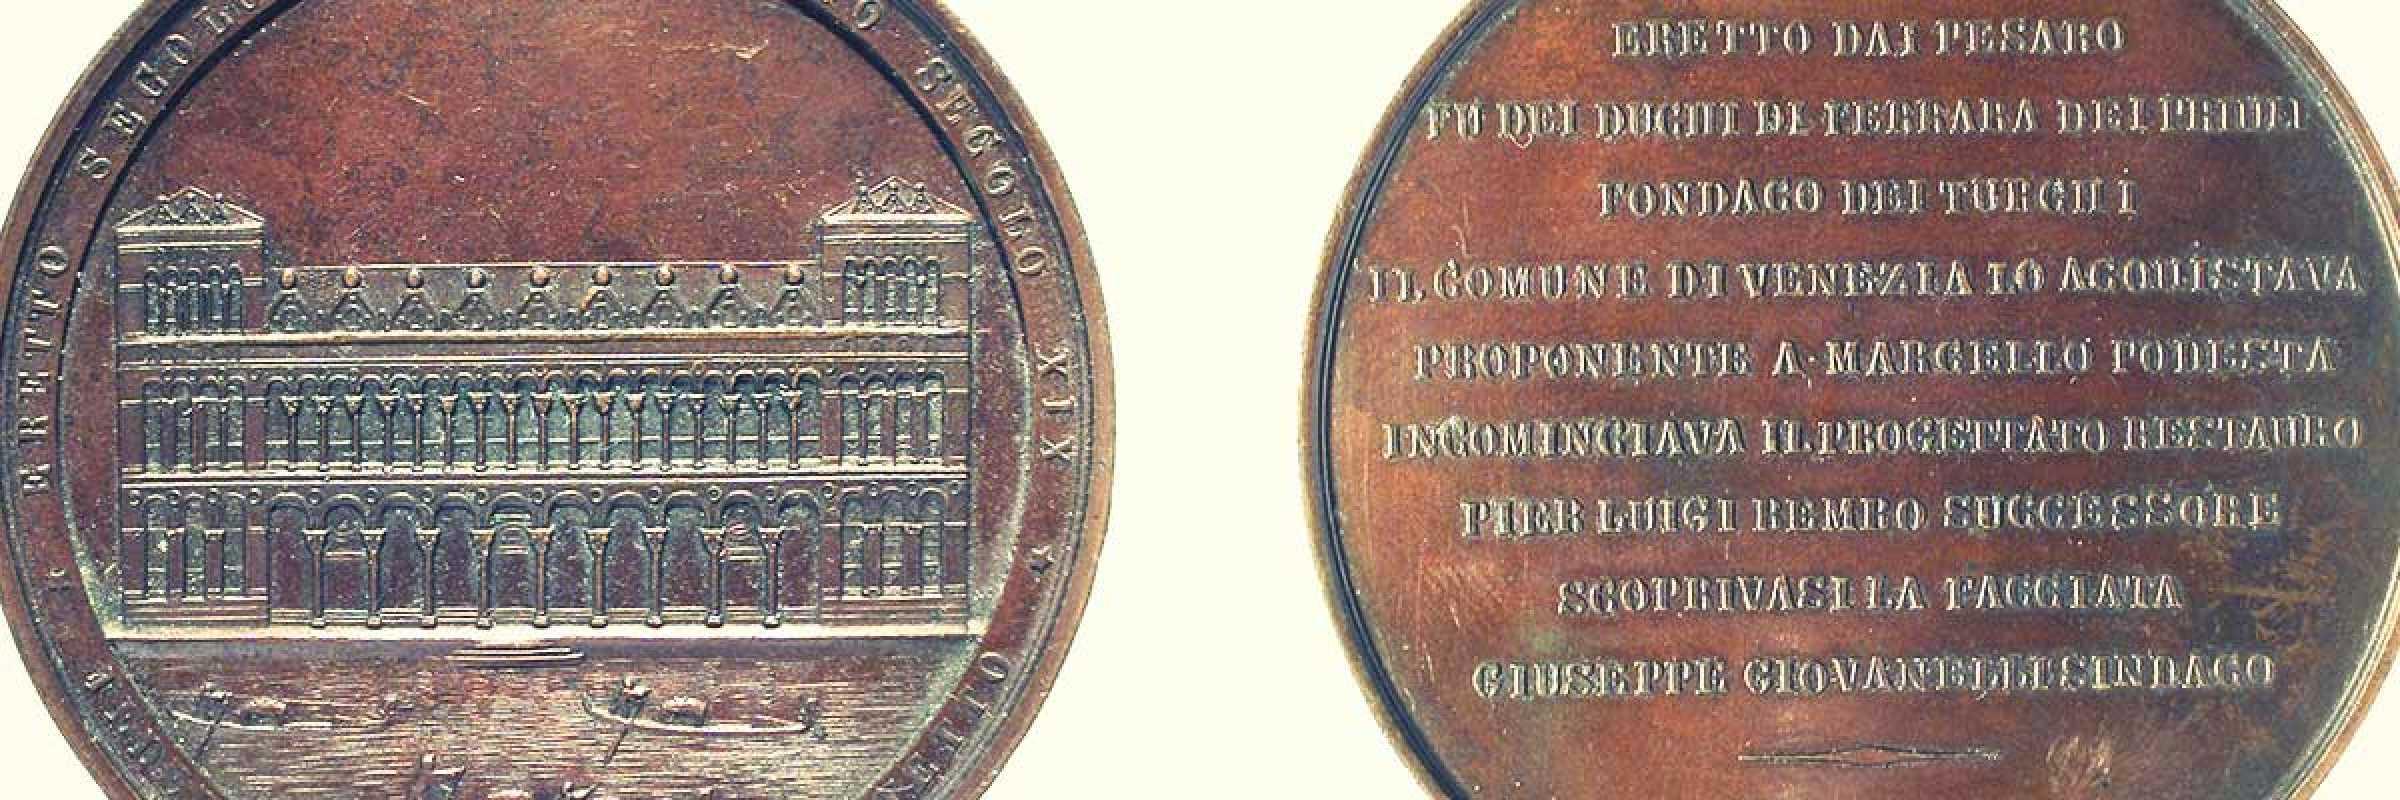 Francesco Stiore, 1869, medaglia Fontego dei Turchi